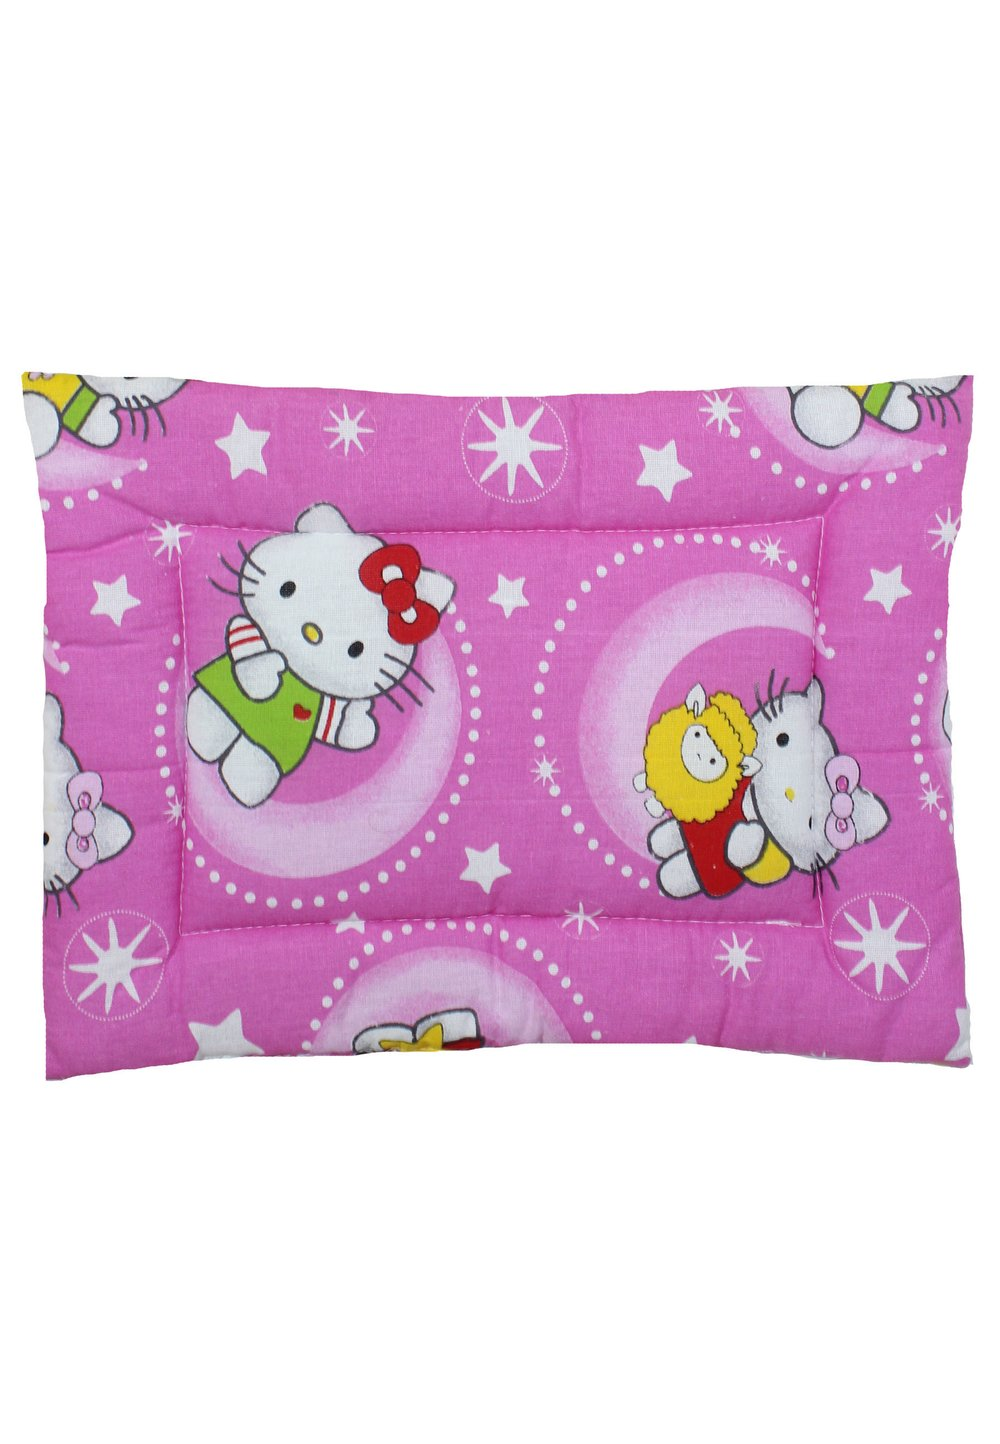 Perna slim, Hello Kitty, roz inchis, 37x28cm imagine